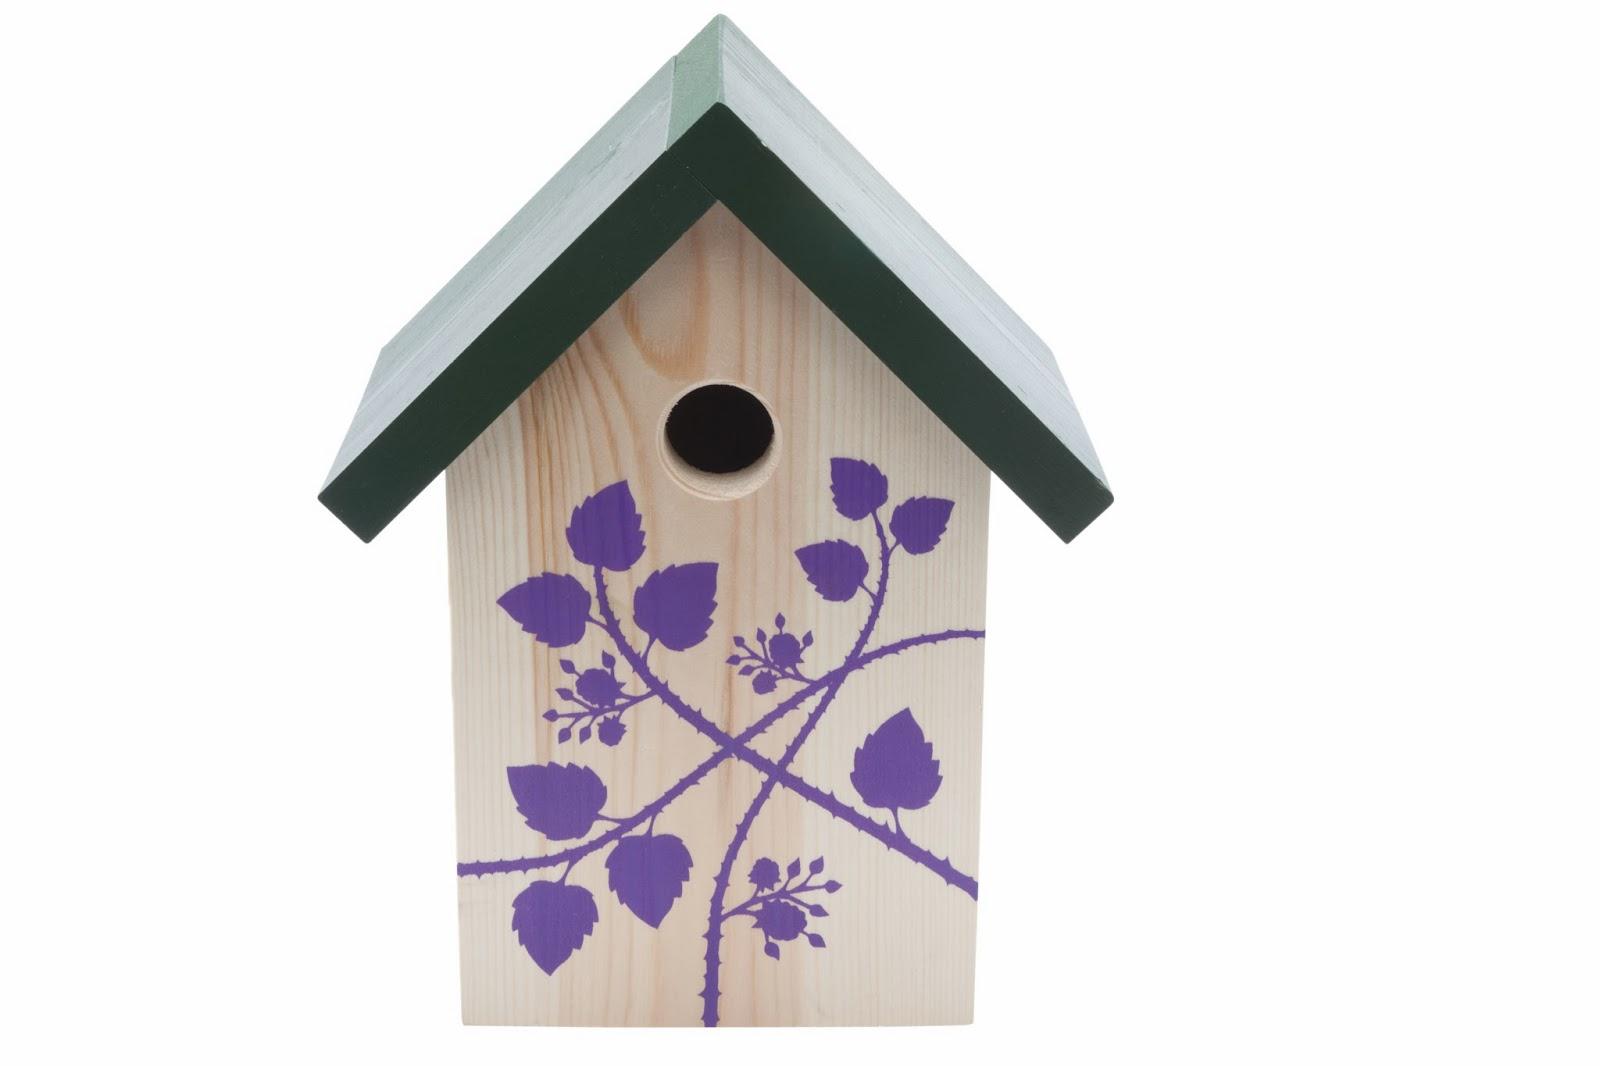 Bramble Nesting Box For Birds